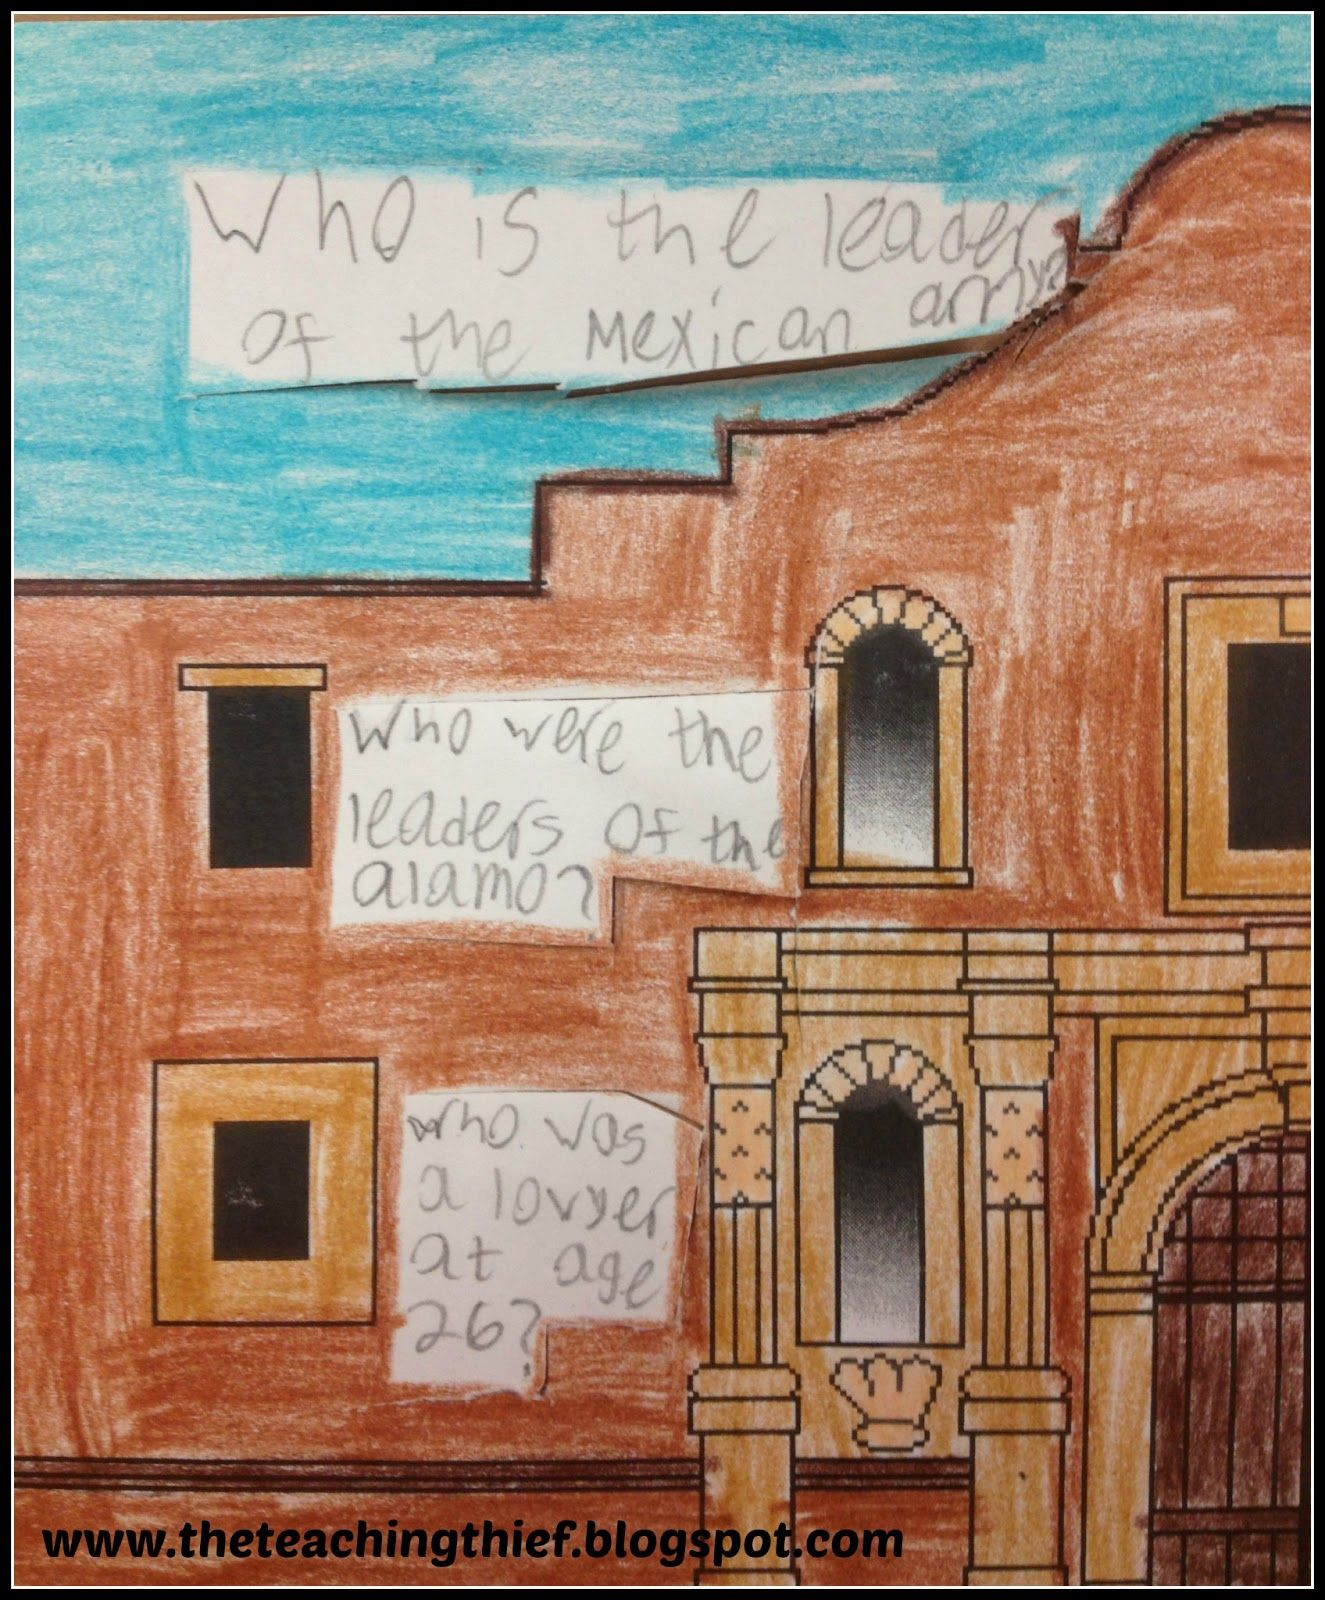 The Teaching Thief Windows Into History